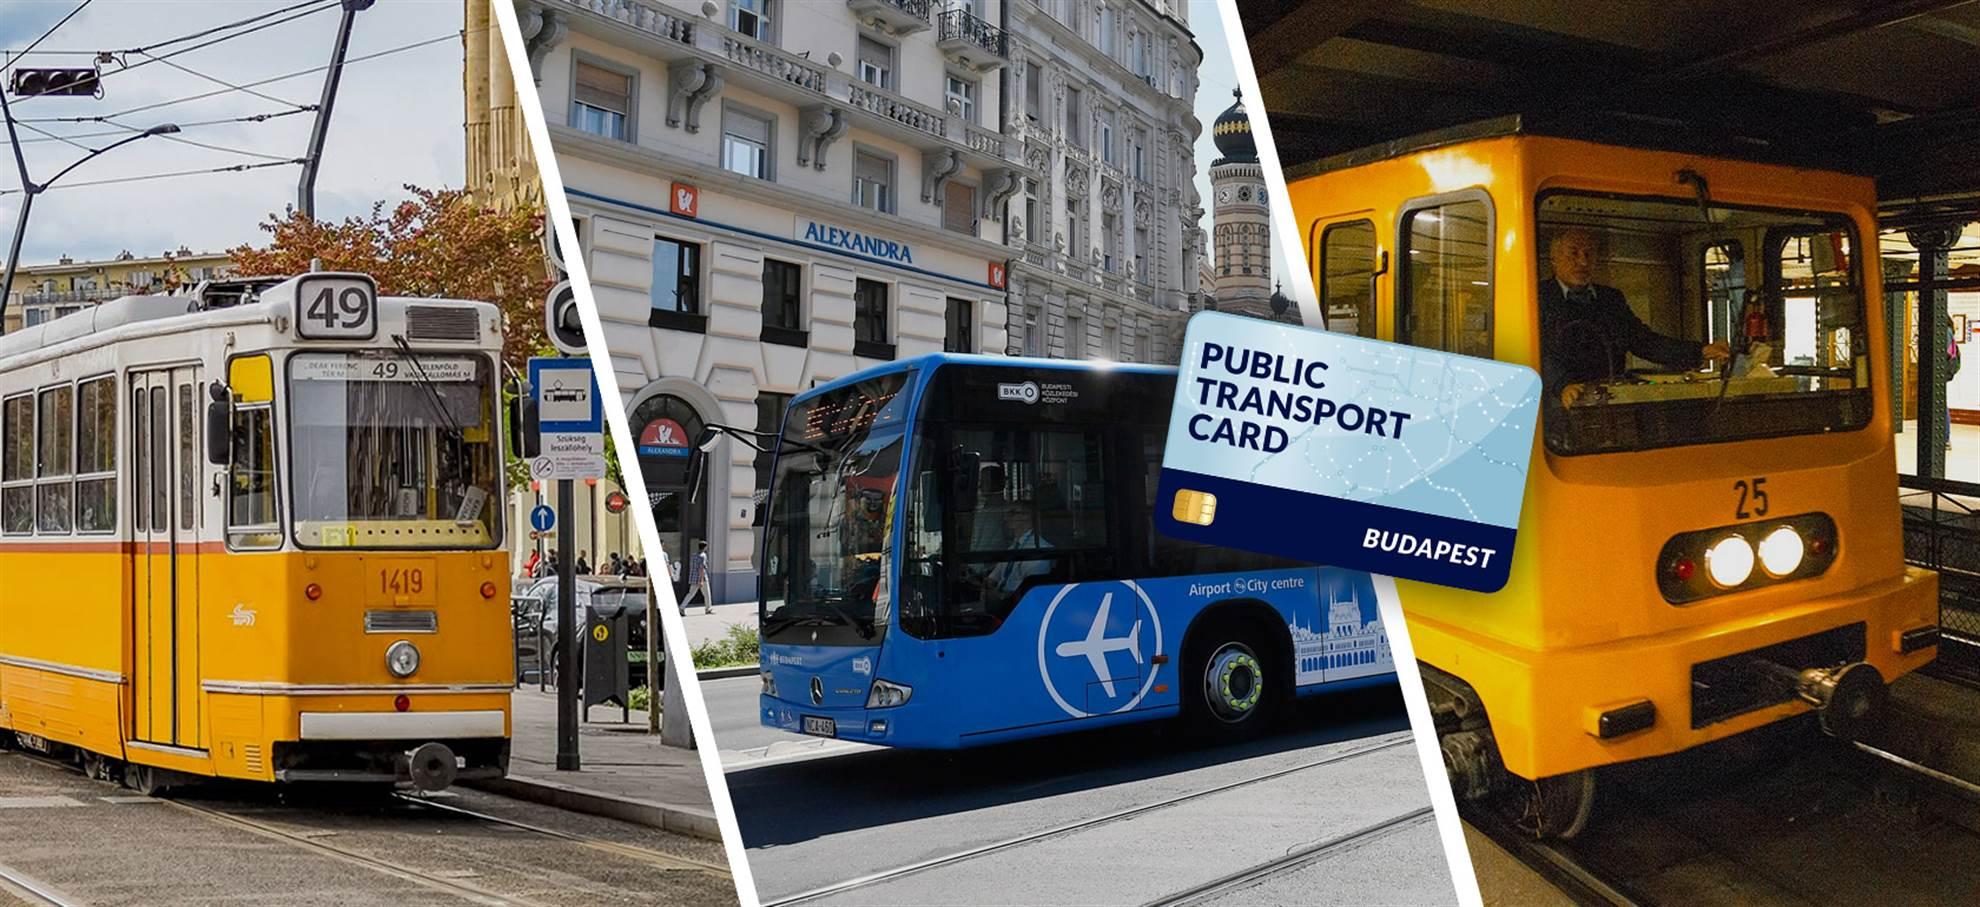 Budapest Travel Card